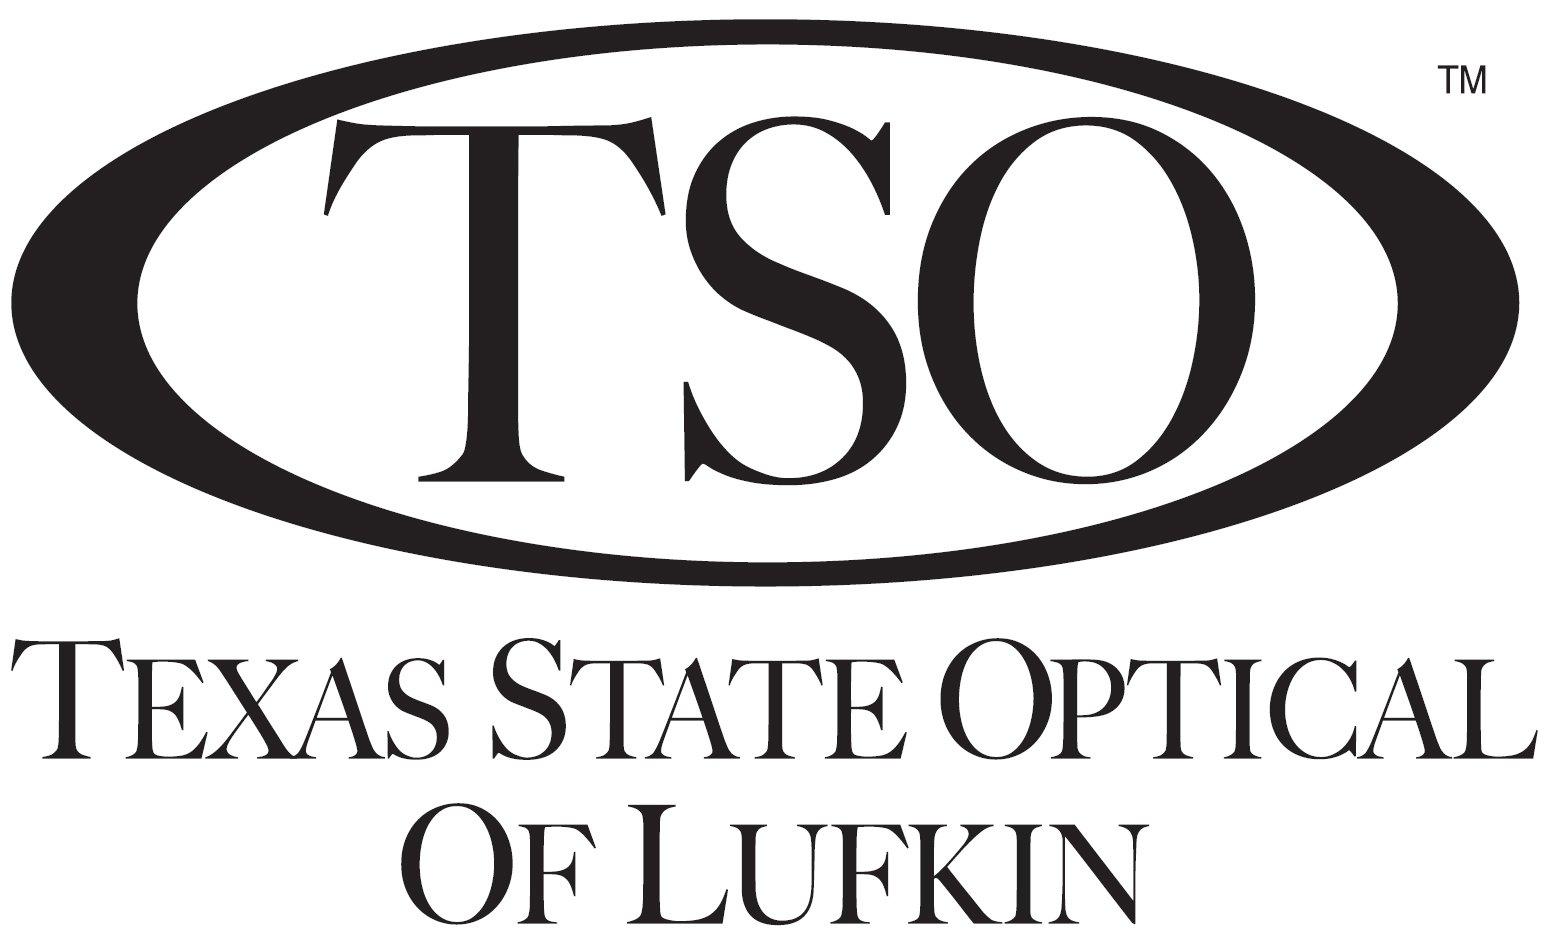 Texas State Optical of Lufkin | Optometry Service Lufkin TX